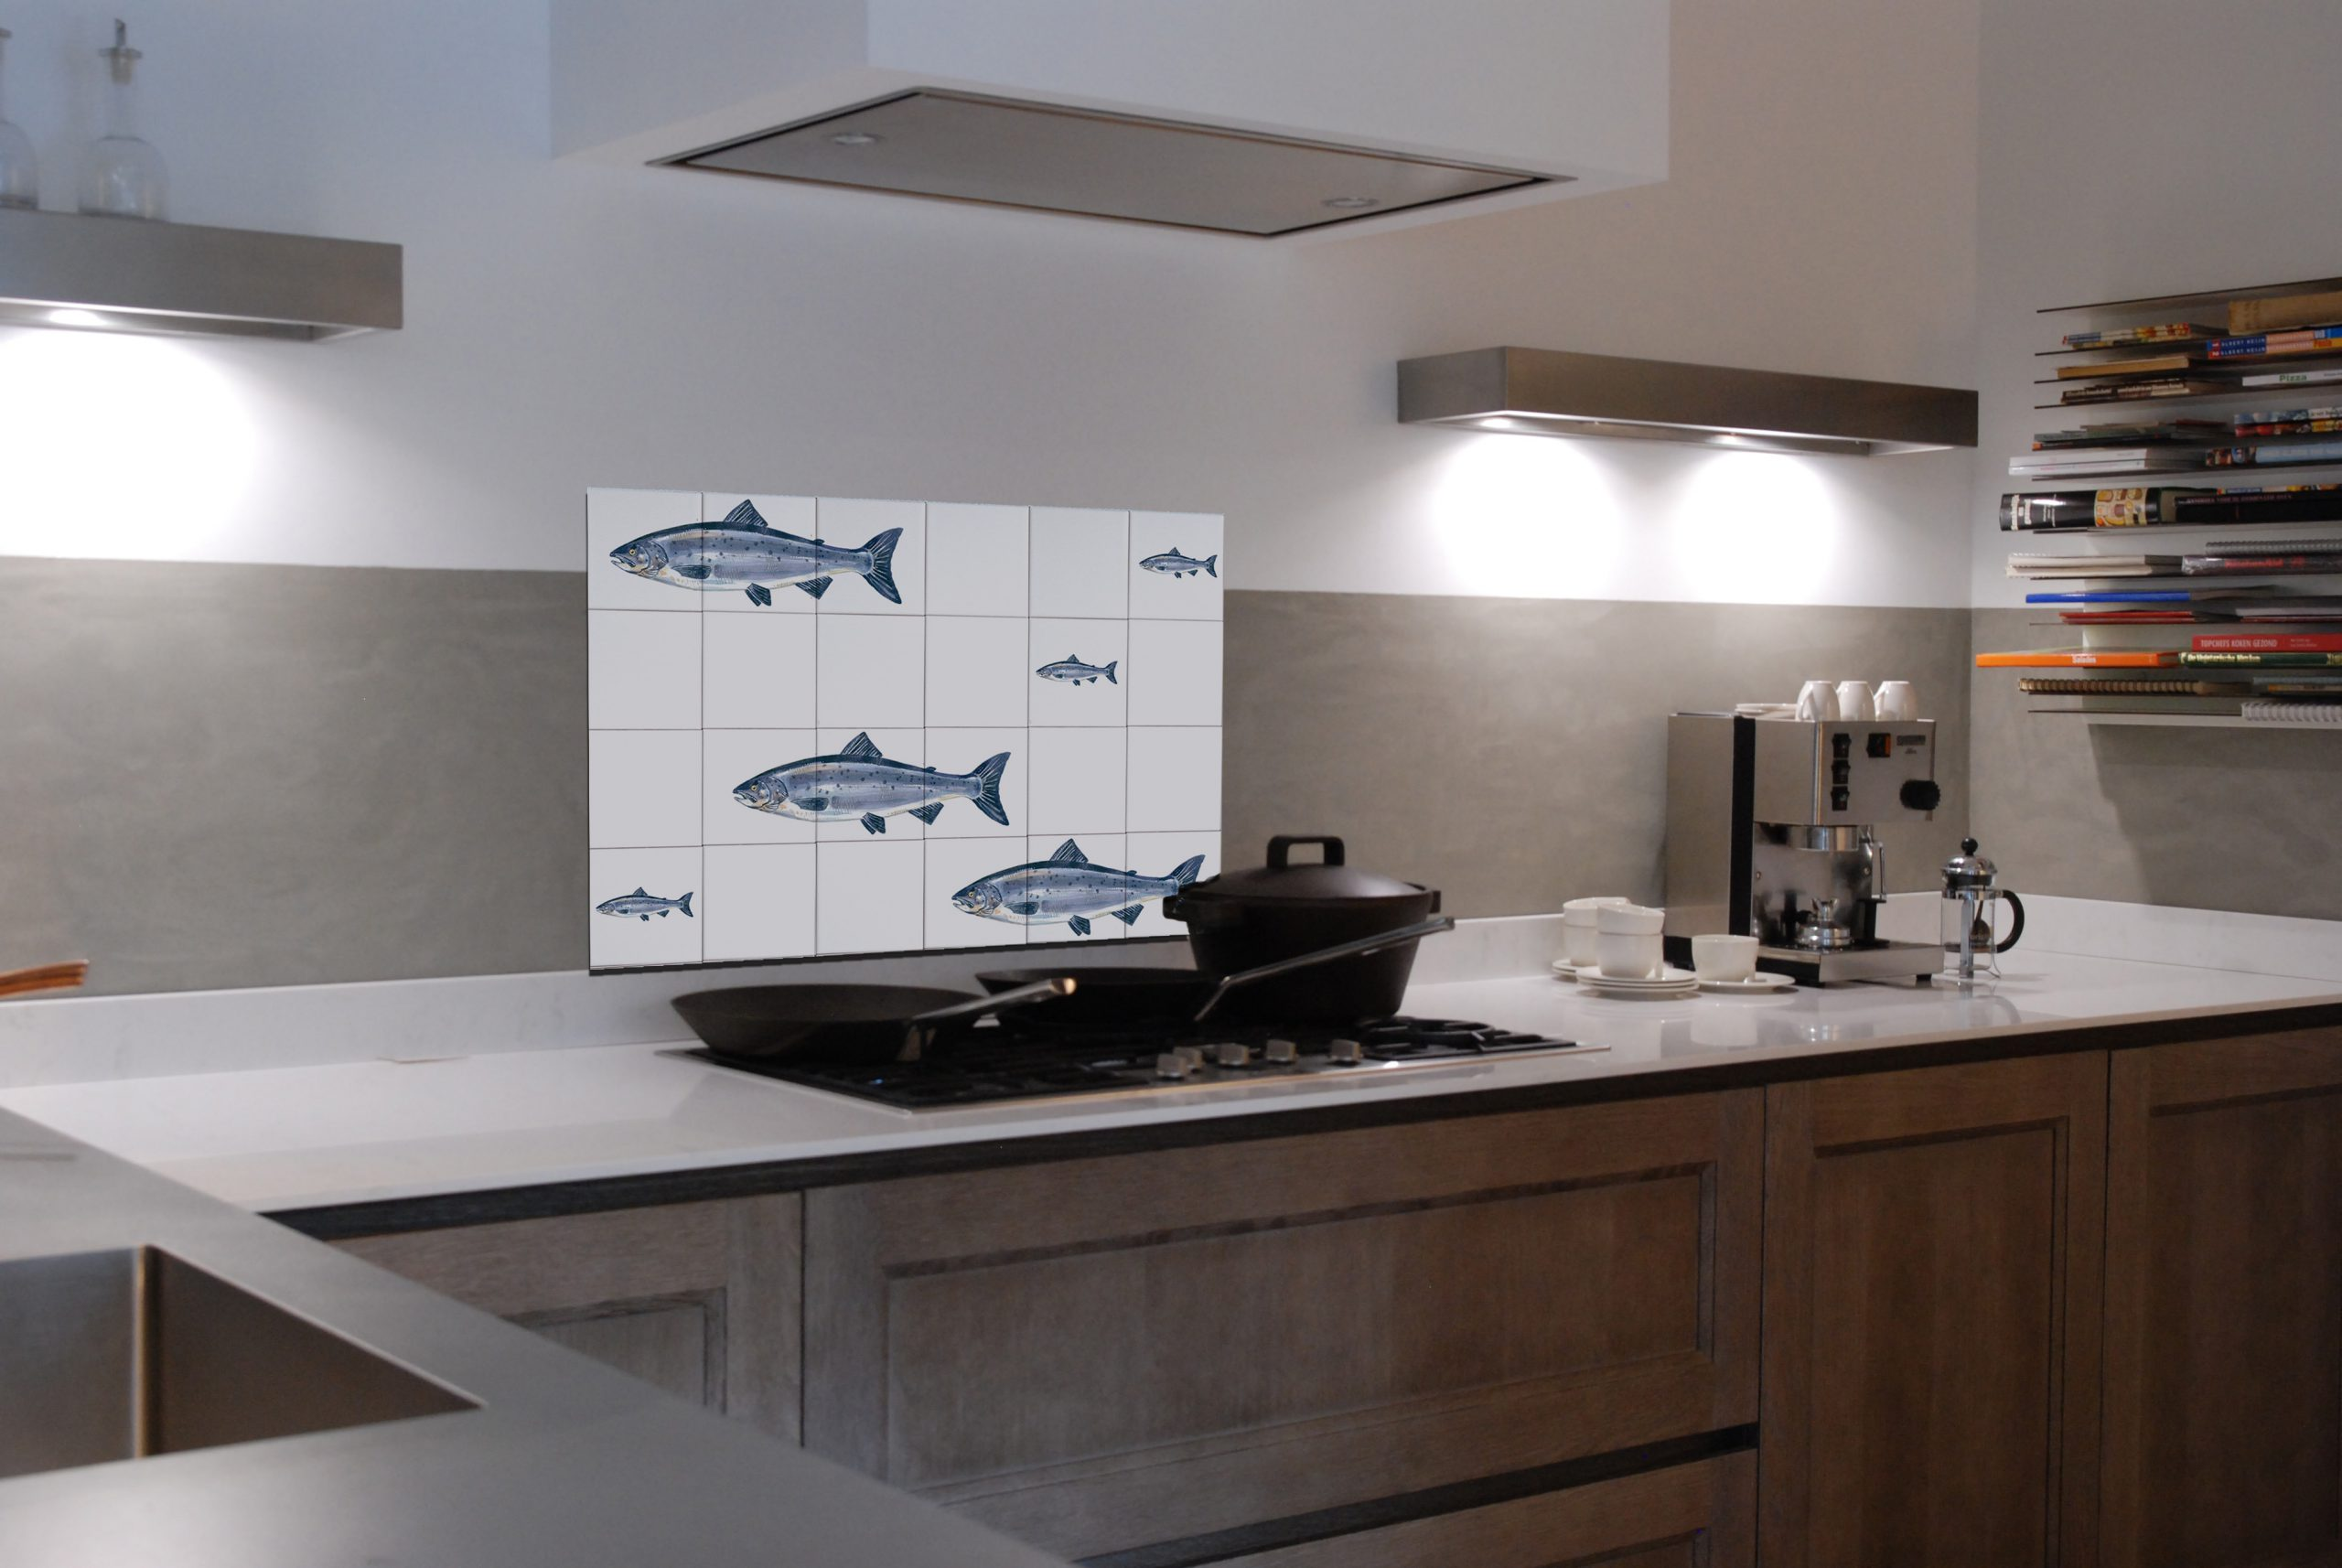 Salmon backsplash panel